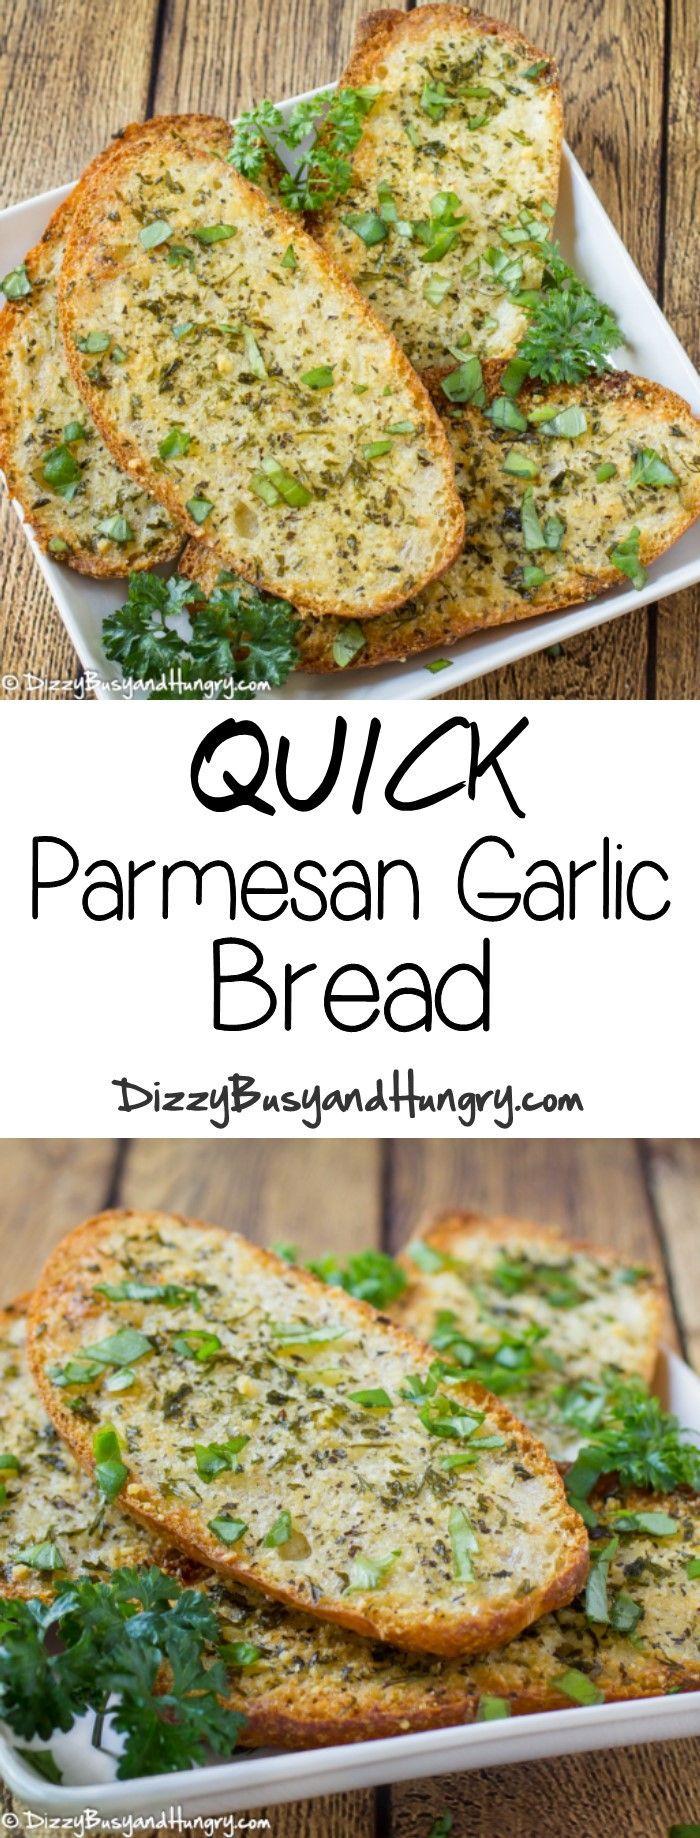 Quick Parmesan Garlic Bread http://www.dizzybusyandhungry.com/quick-parmesan-garlic-bread/